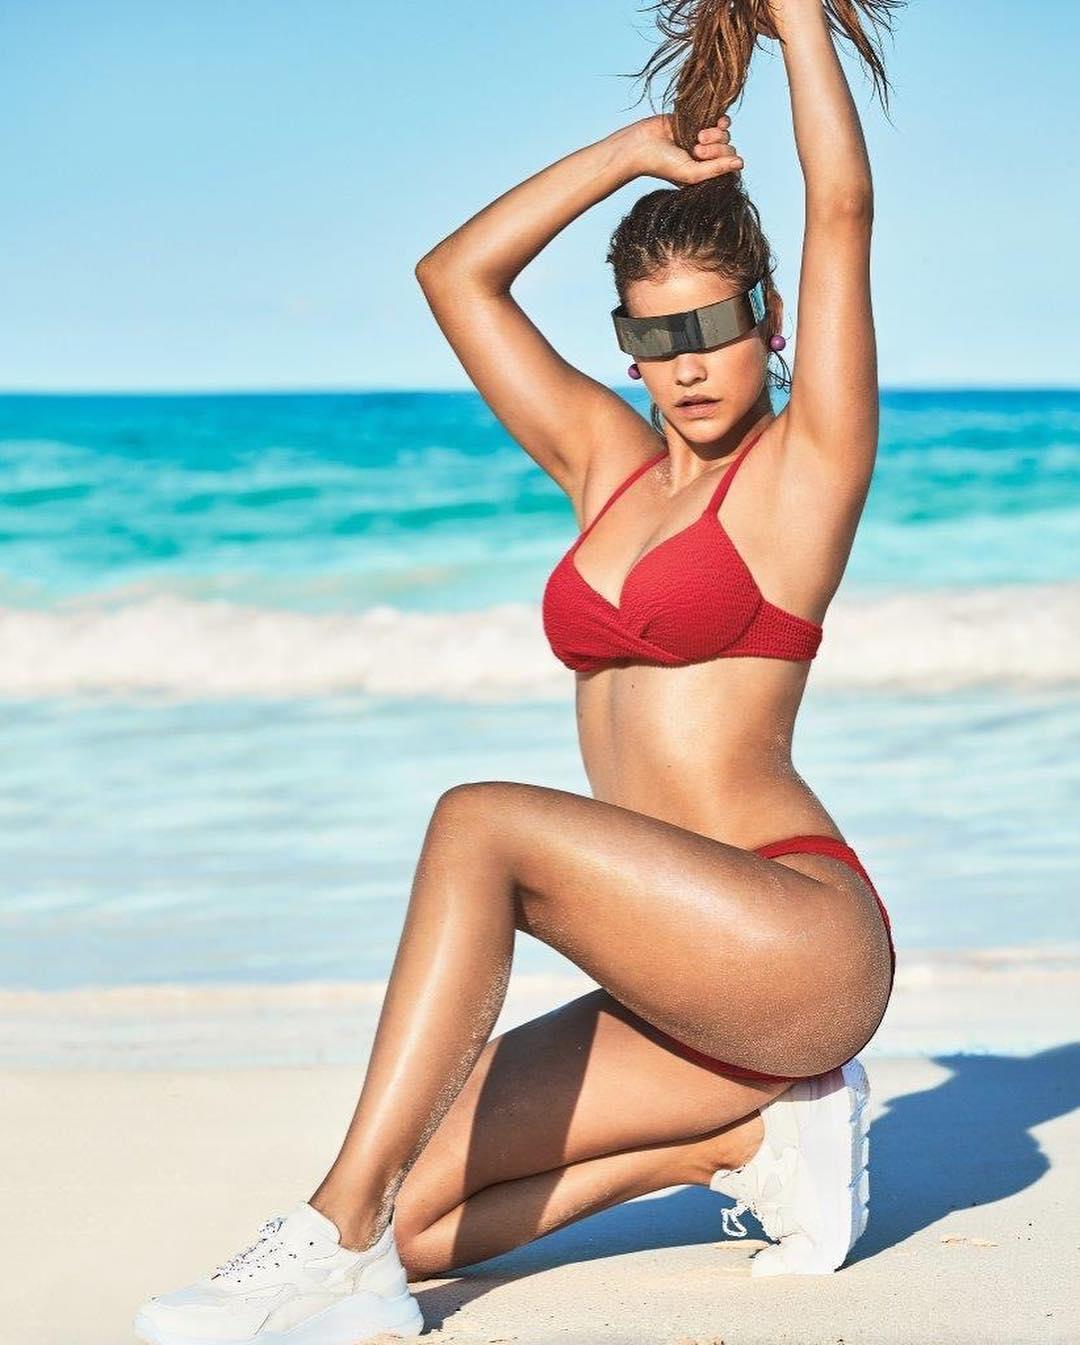 barbara palvin beach photoshoot